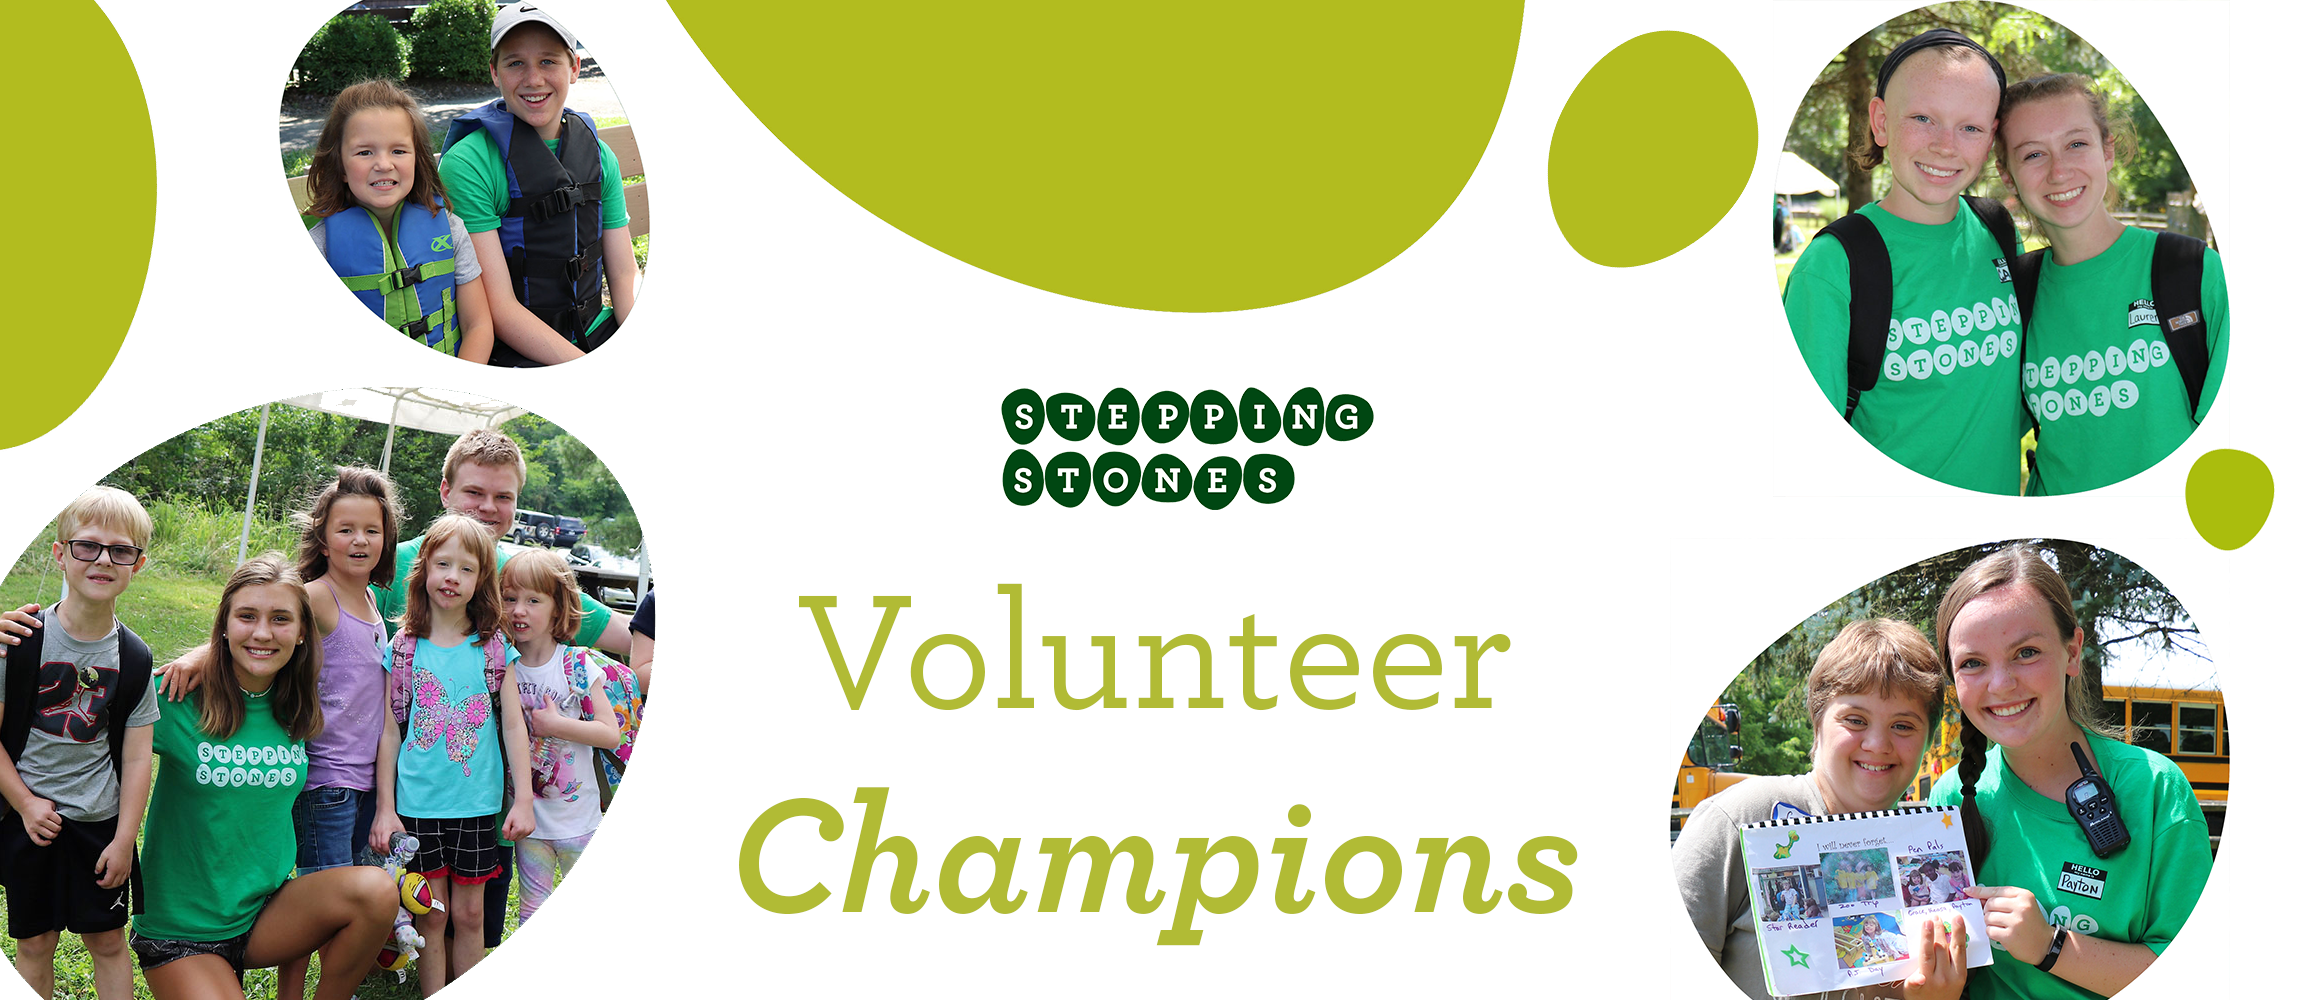 Stepping Stones Volunteer Champions Program I Cincinnati, Ohio